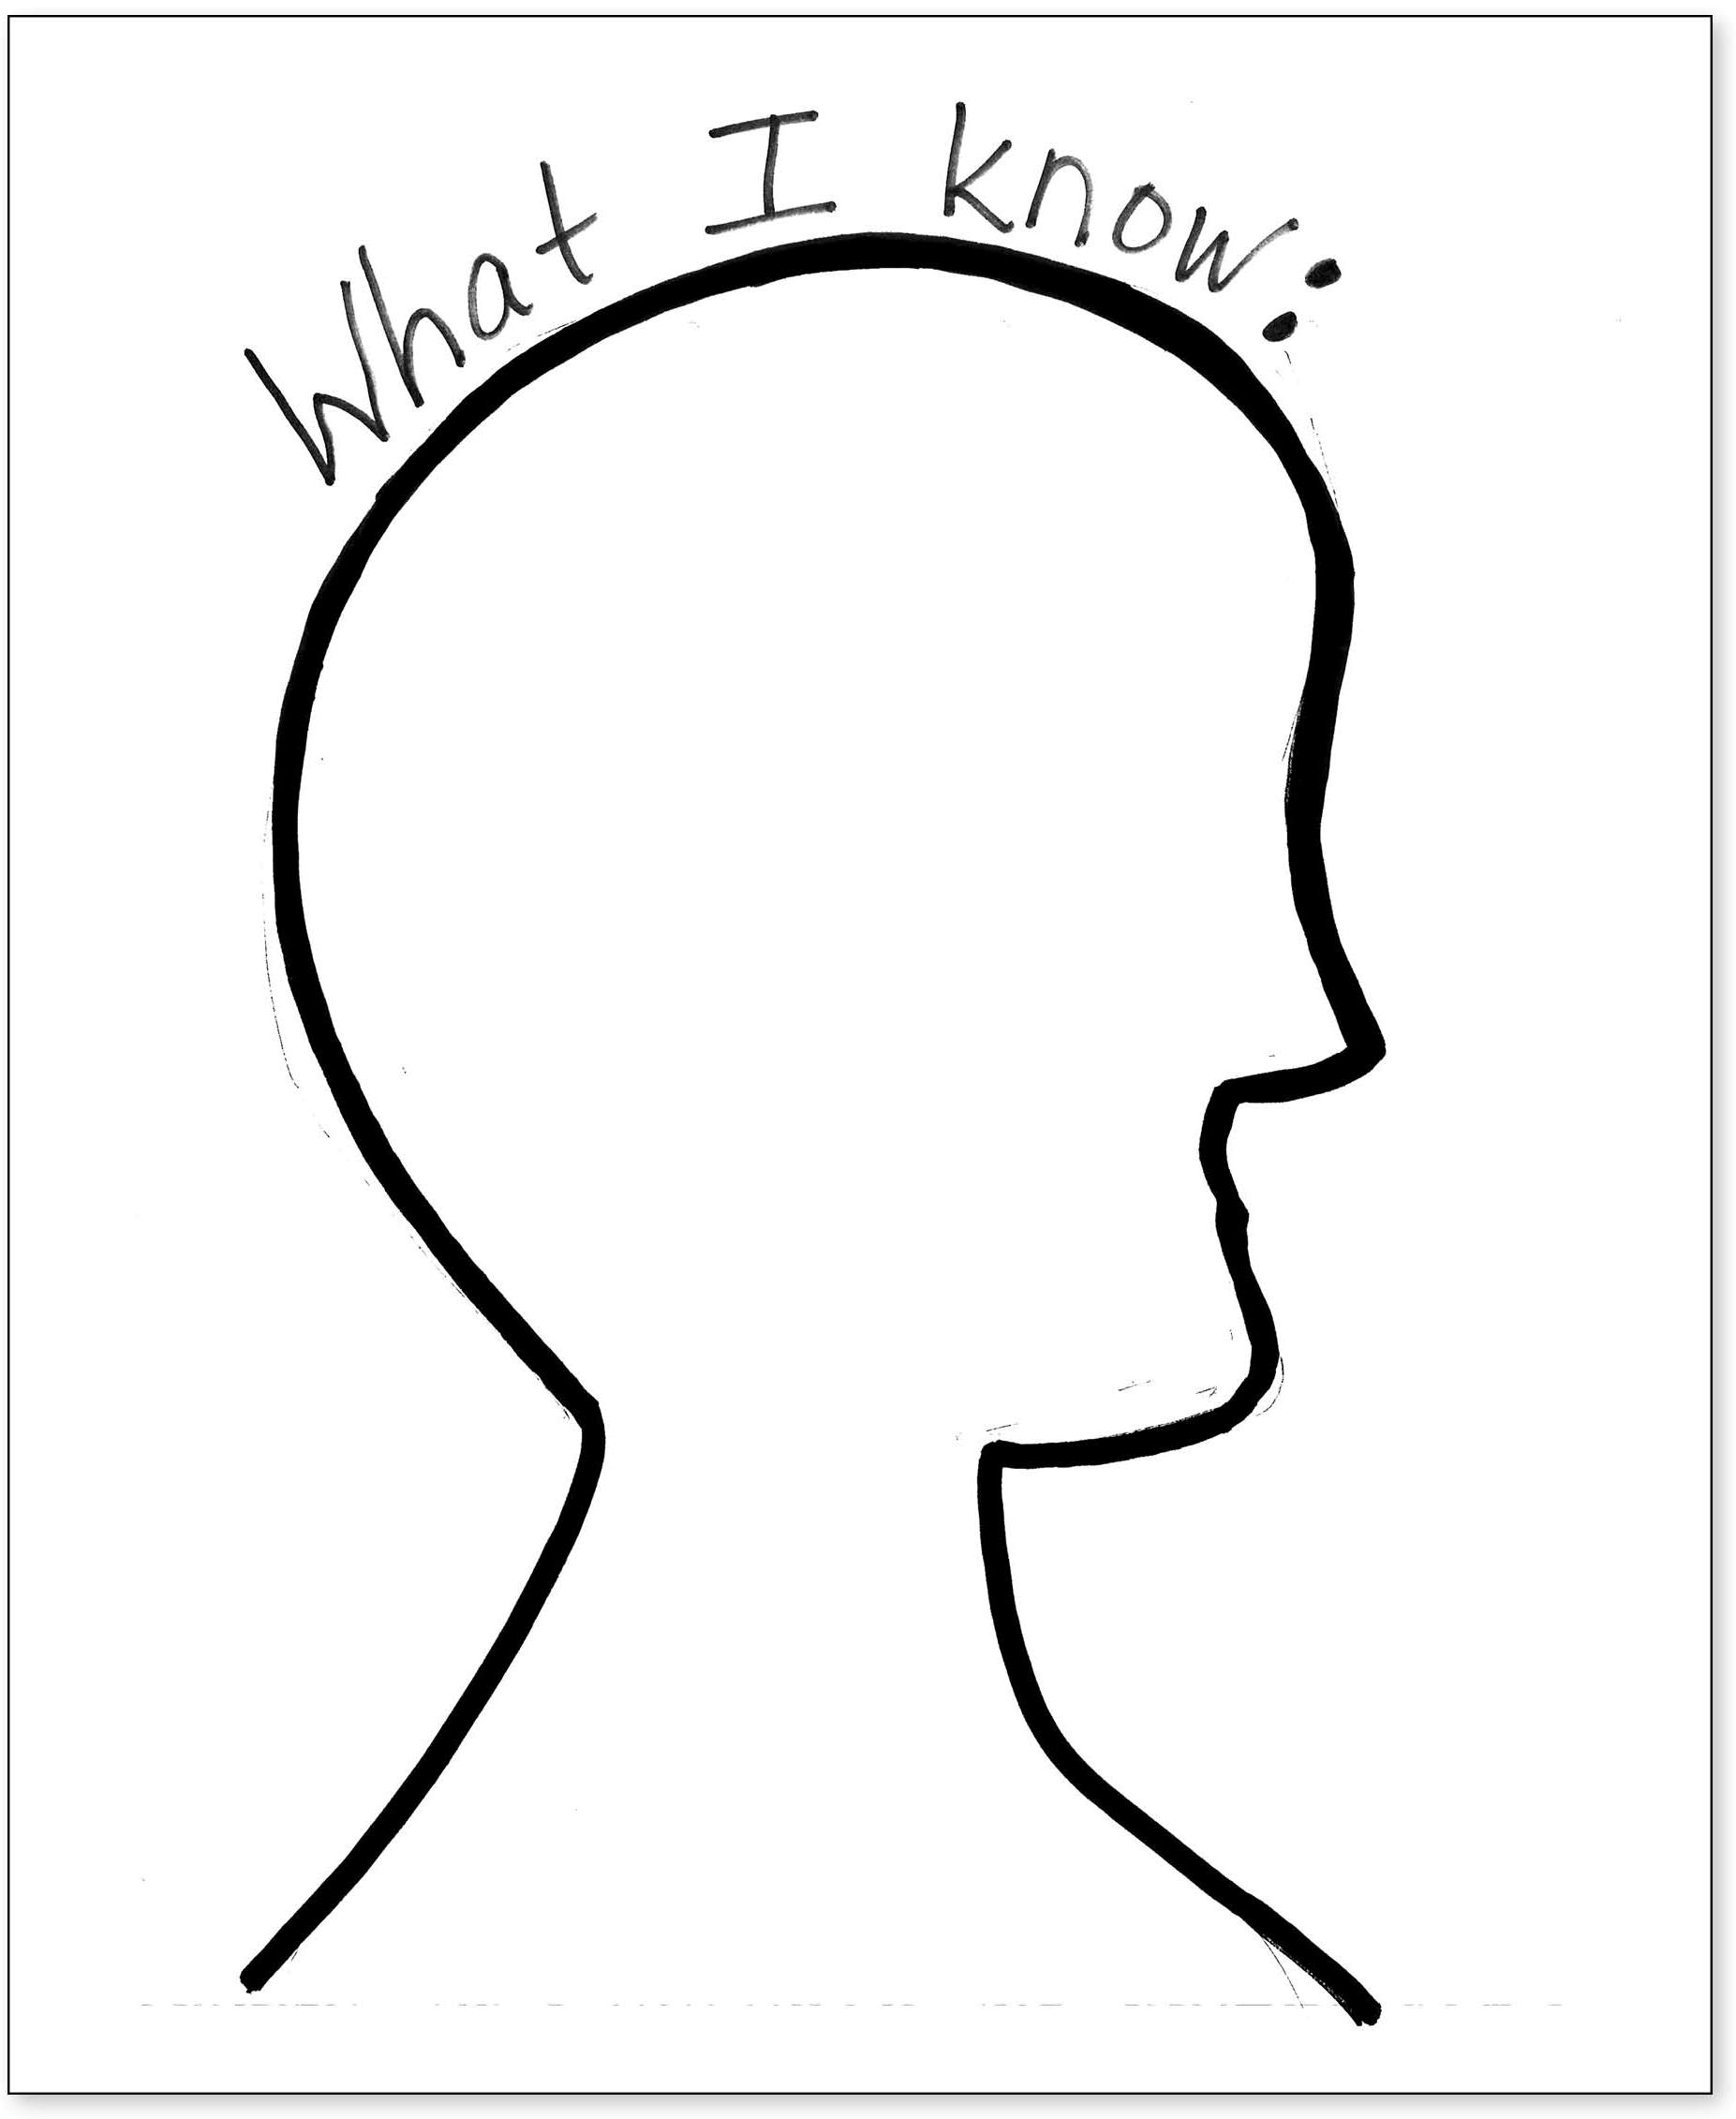 Main-Idea Silhouette Head